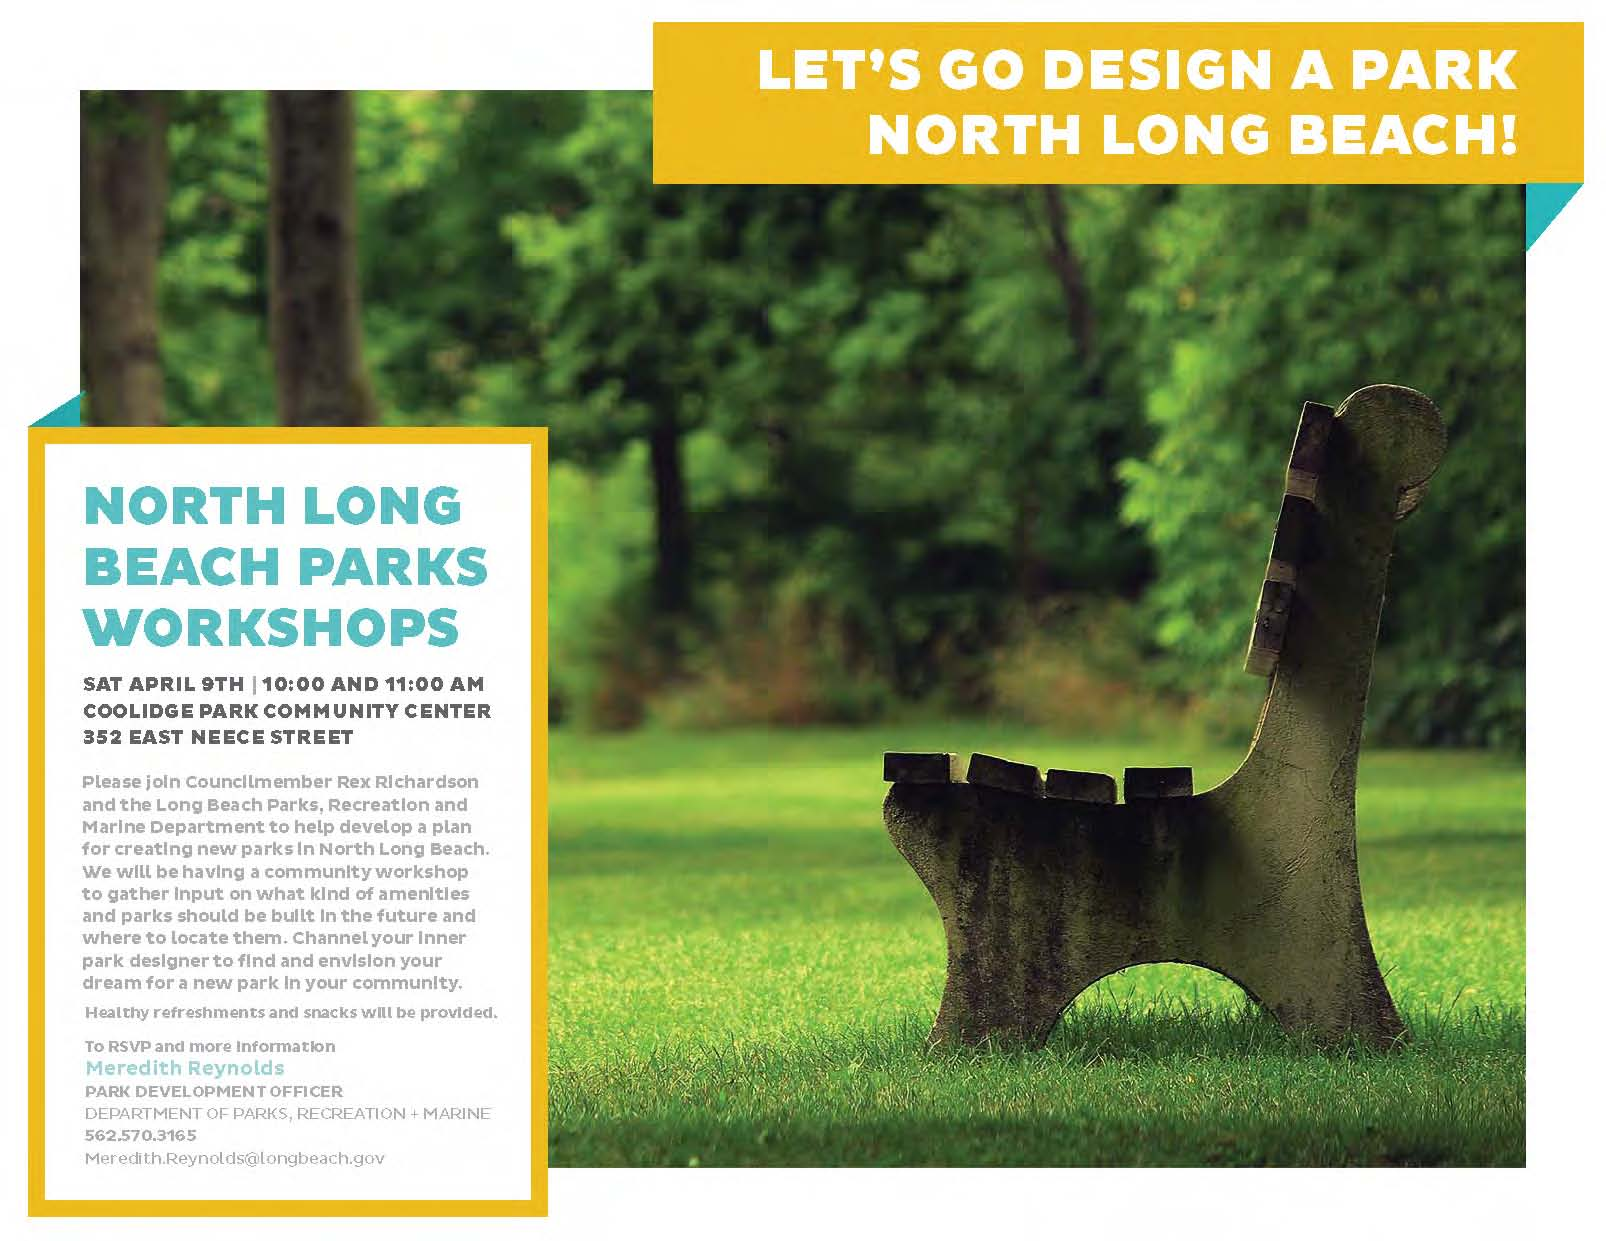 North_Long_Beach_Parks_Workshops.jpg